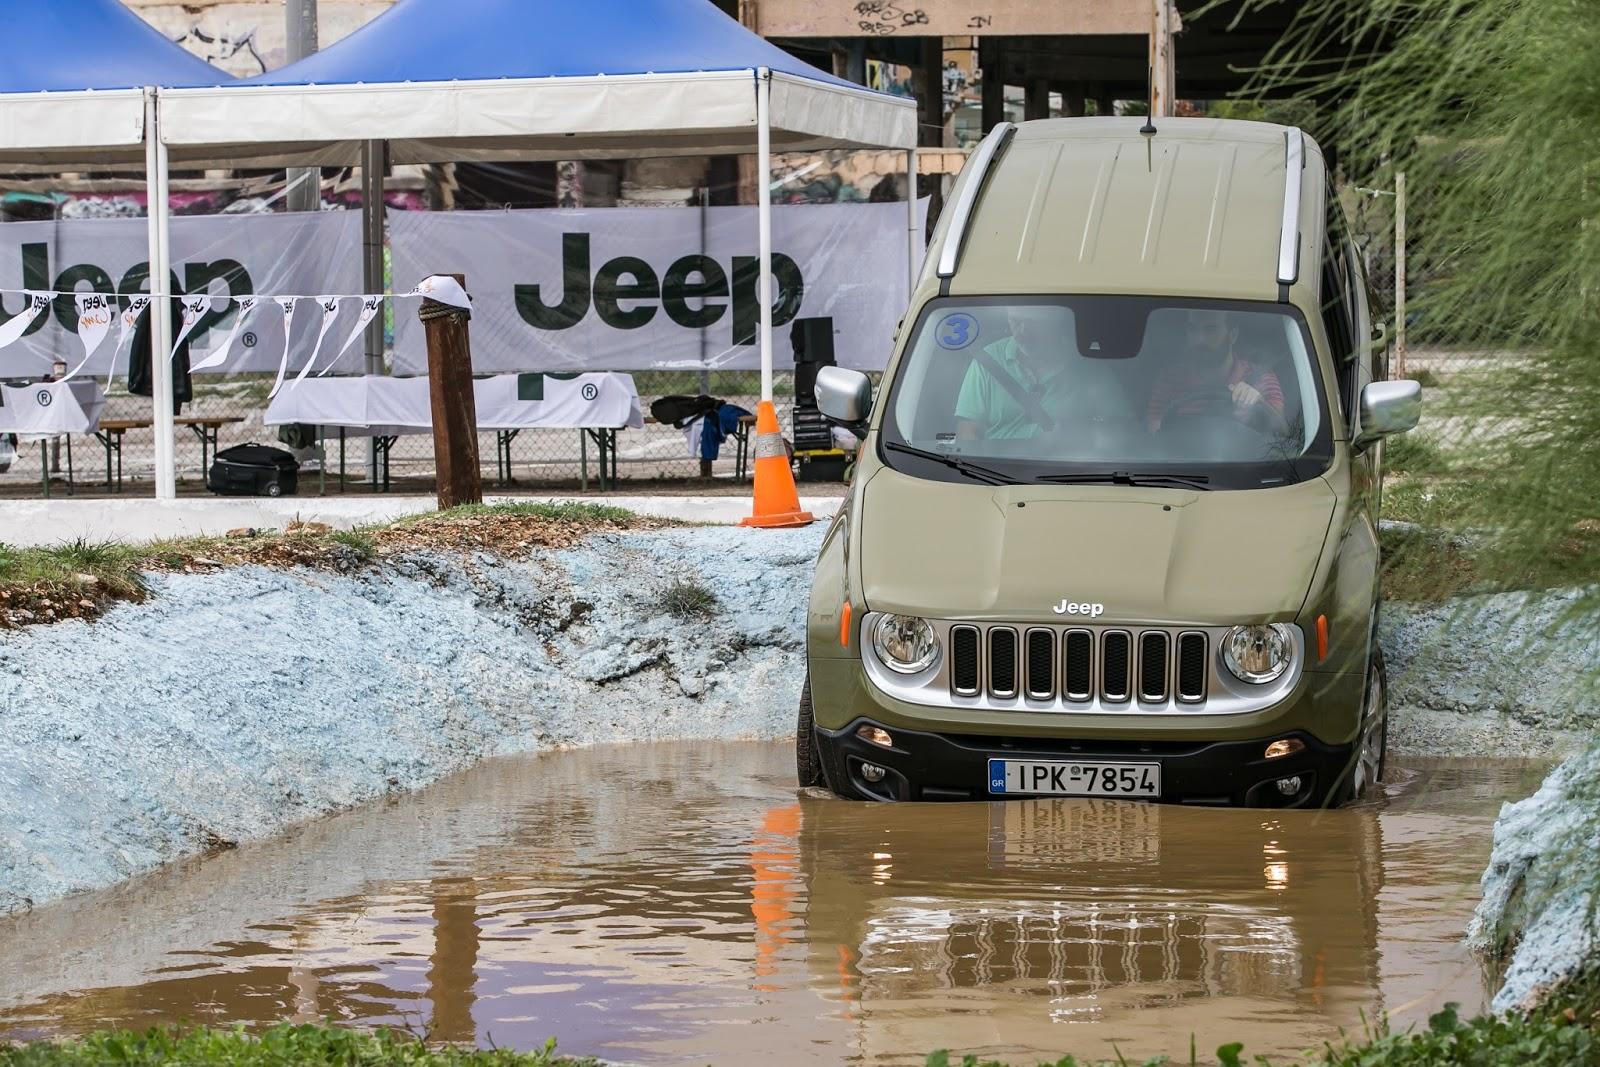 KF 1611 Πετάμε ένα Jeep Renegade σε λάσπες, πέτρες, άμμο, λίμνες. Θα τα καταφέρει; Jeep, Jeep Renegade, Renegade, SUV, TEST, zblog, ΔΟΚΙΜΕΣ